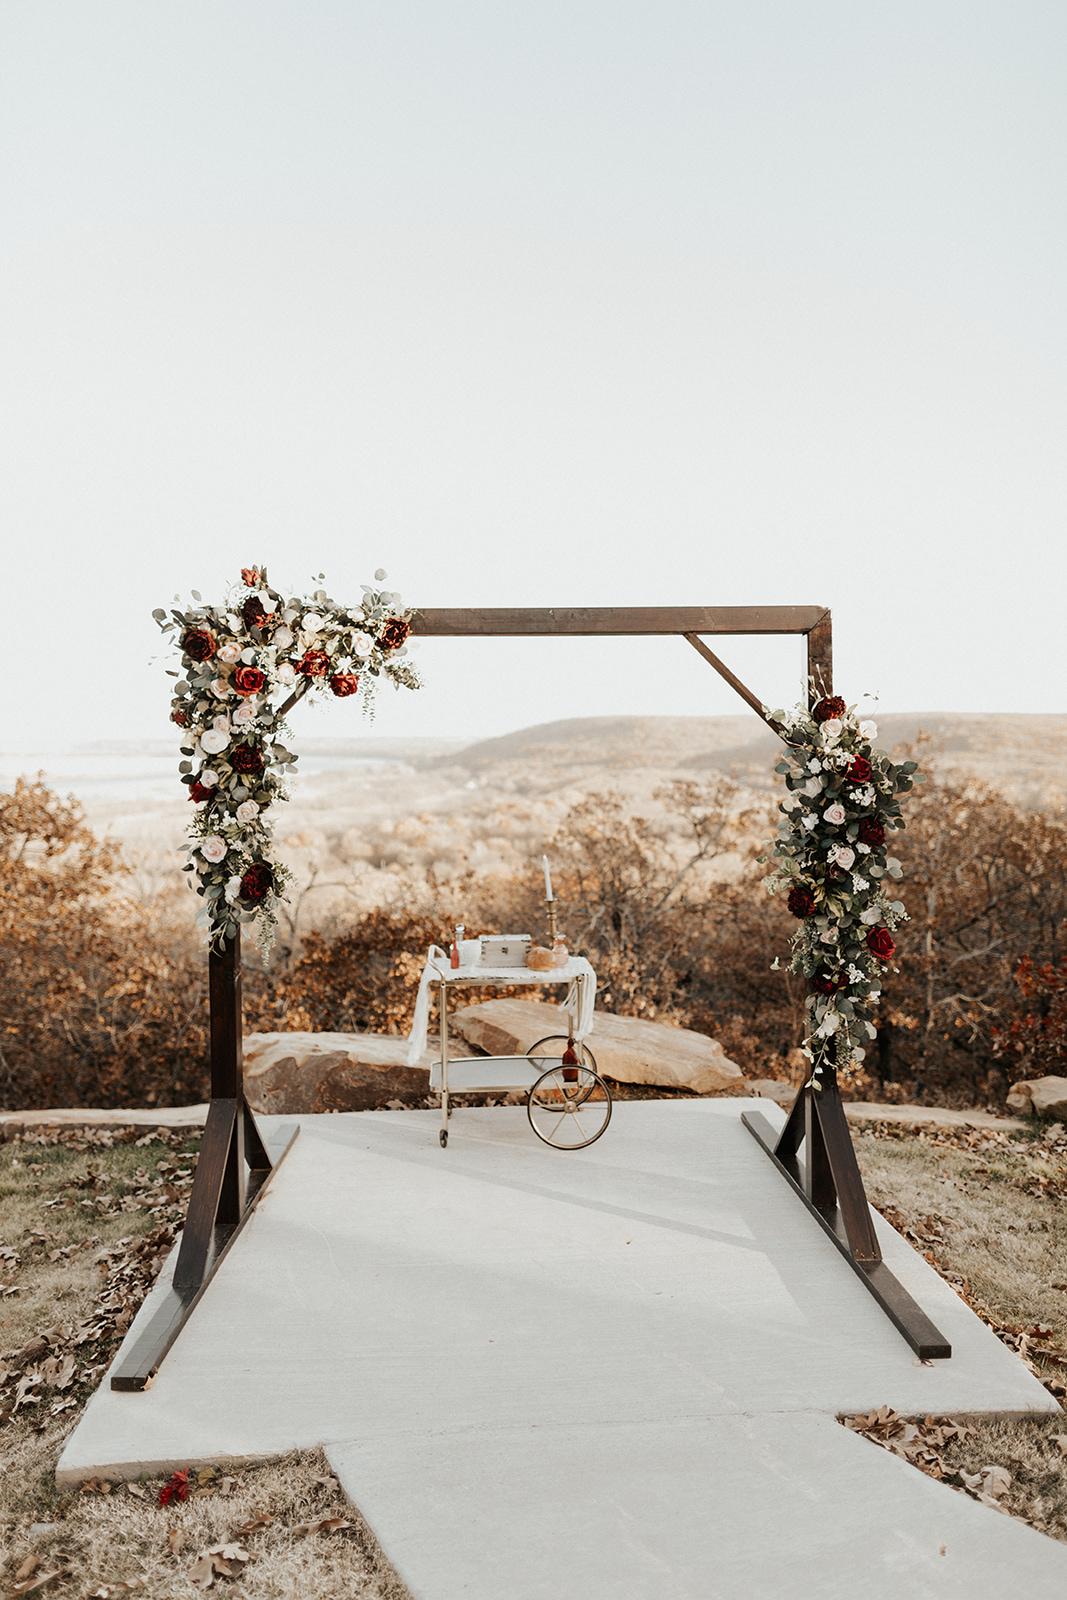 Best Wedding Venue in Tulsa Bixby Dream Point Ranch 42.jpg